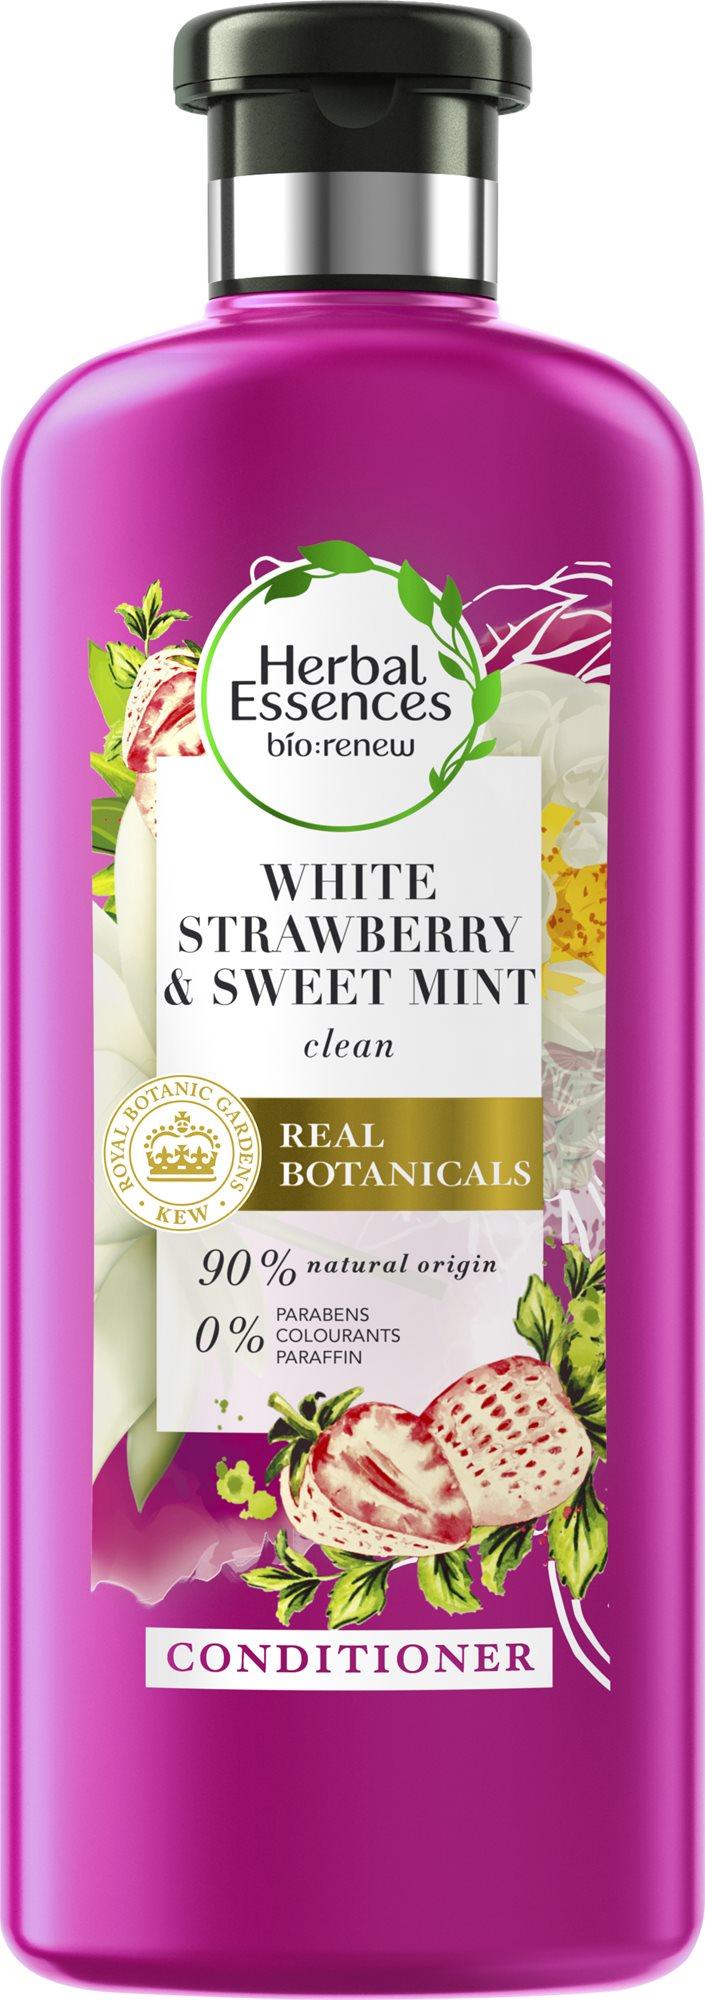 Herbal Essence Strawberry Mint 360 ml